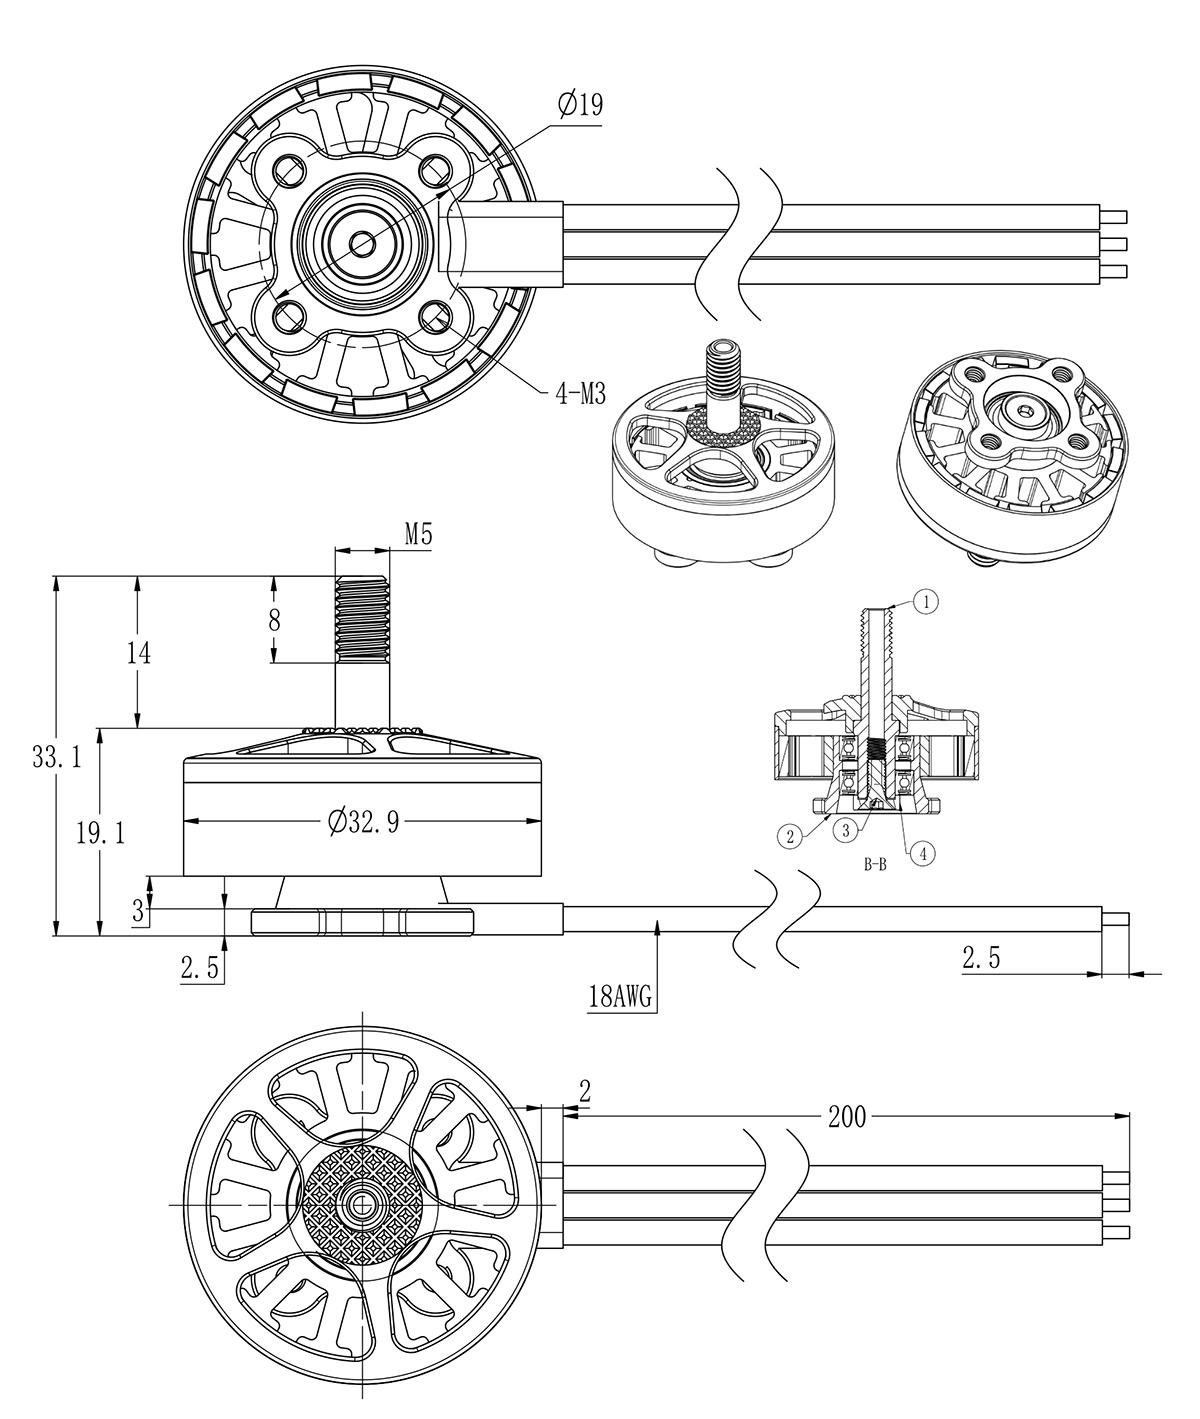 Brotherhobby 2806.5 motor